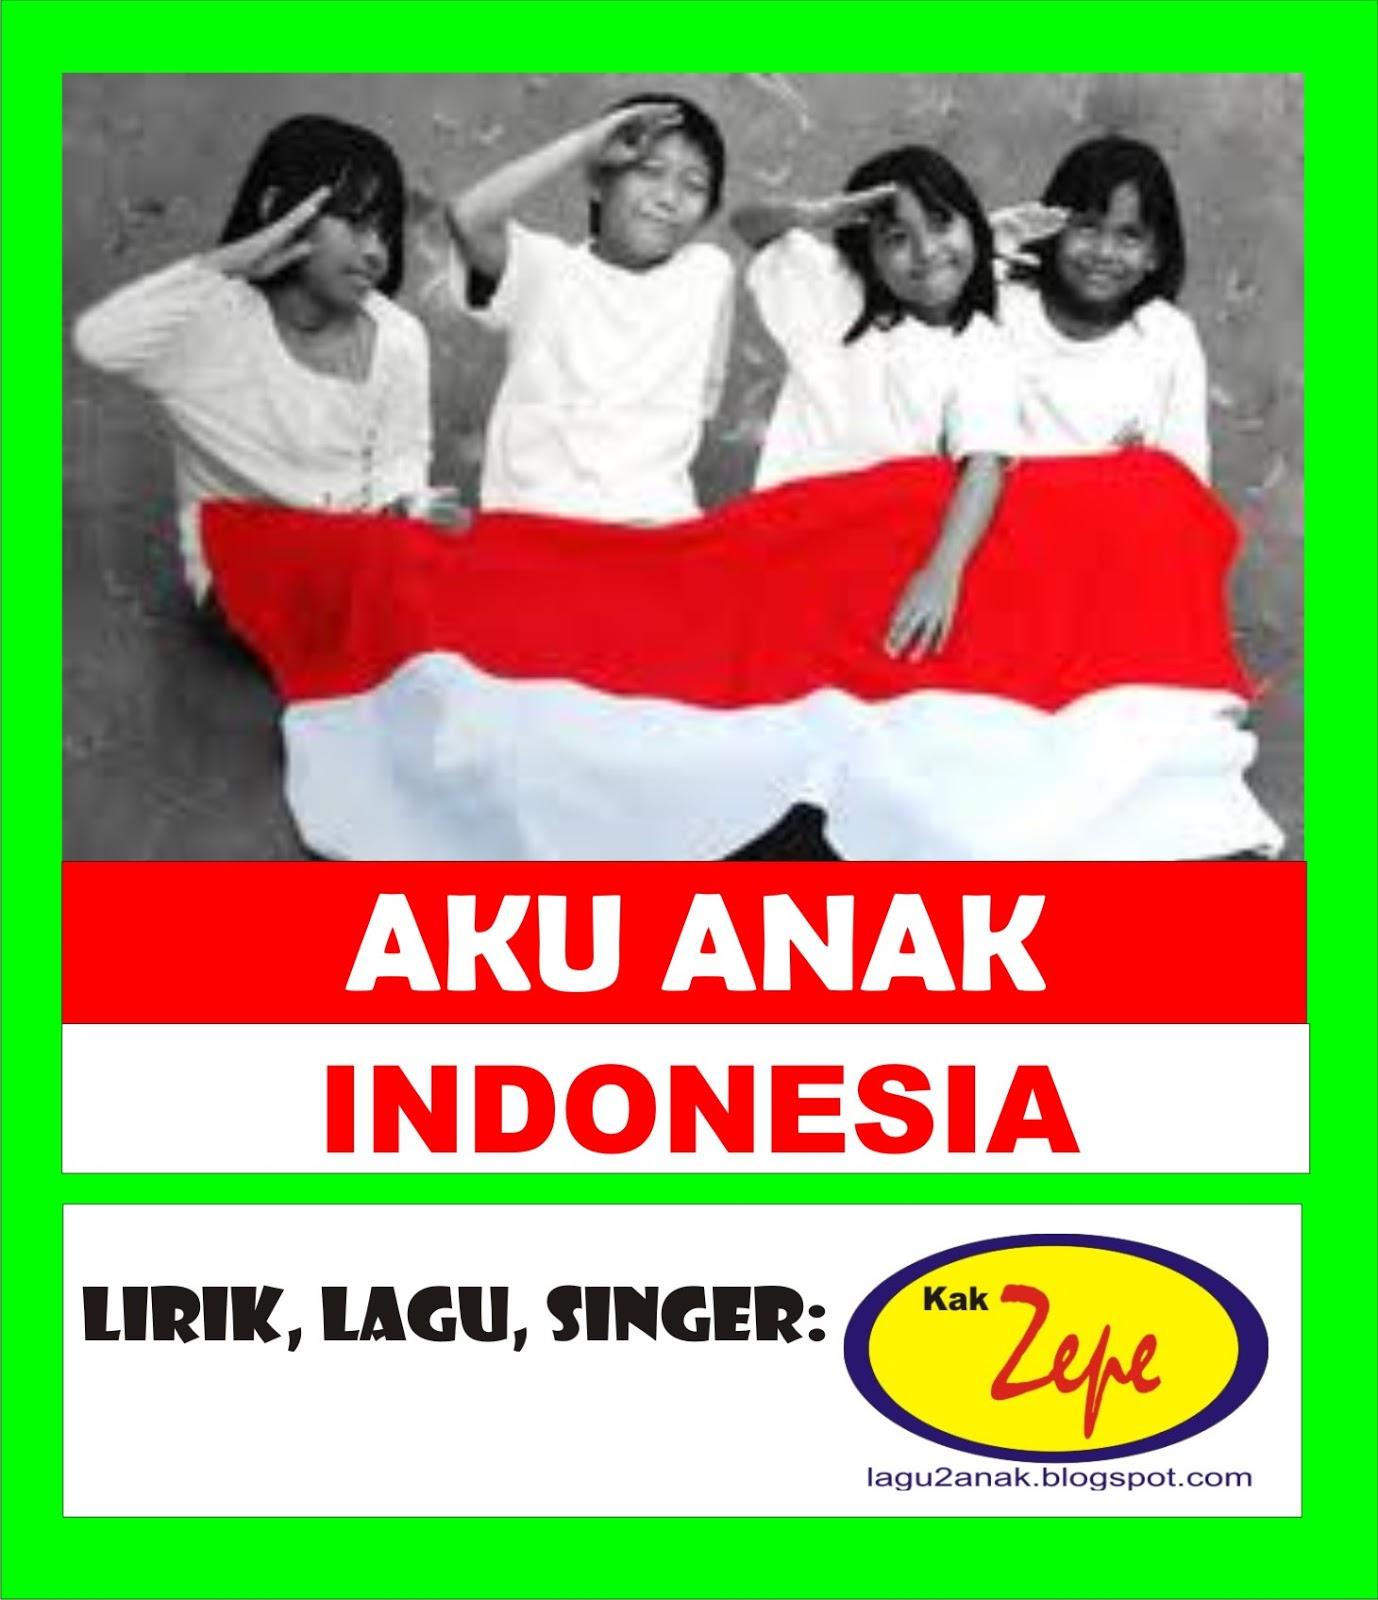 Youtube Indonesia: Download Lagu Anak Bahasa Indonesia & Inggris,dongeng